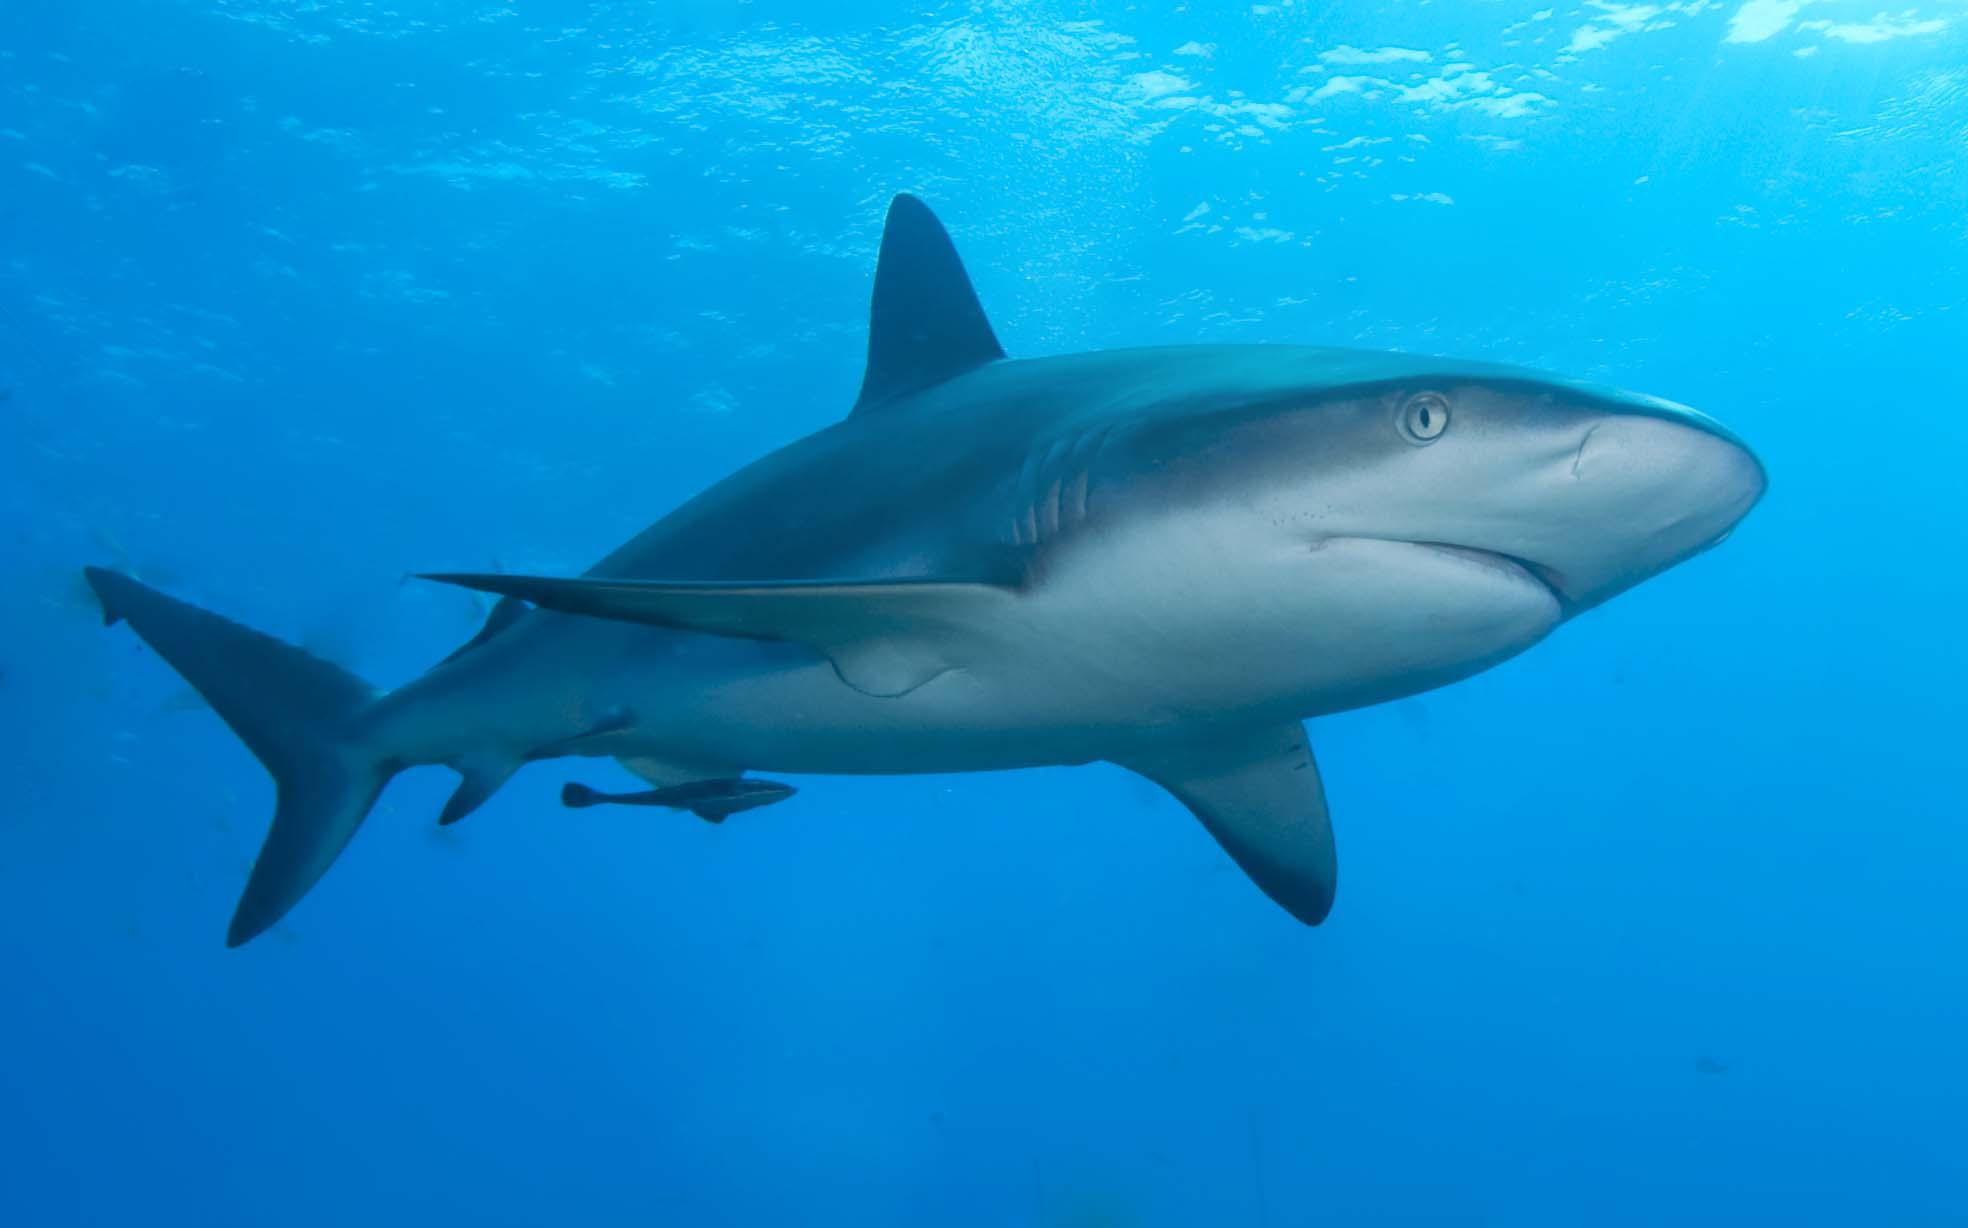 Shark. Stock image.